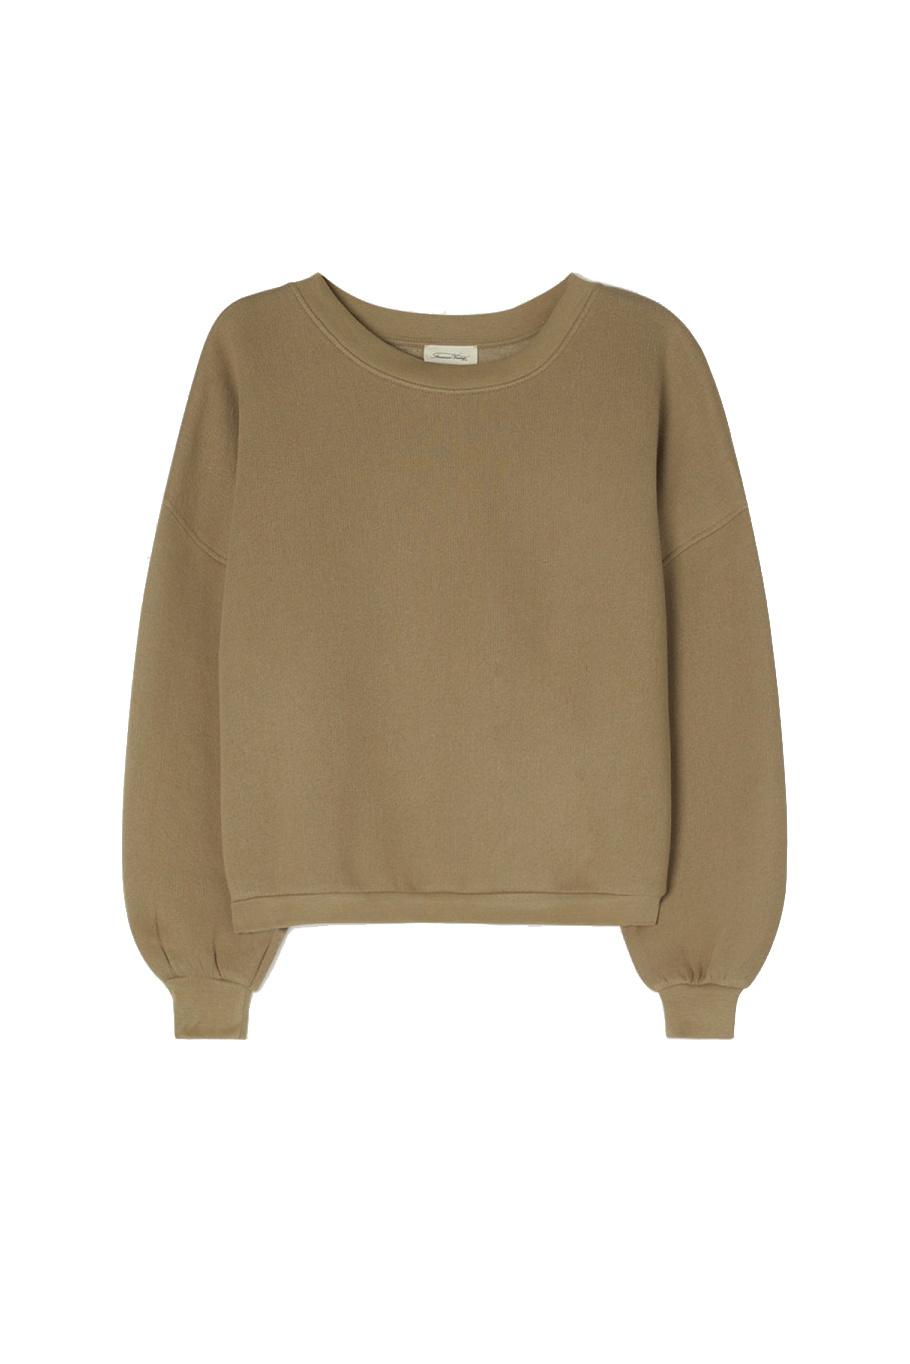 Ikatown Sweatshirt - Herisson-1